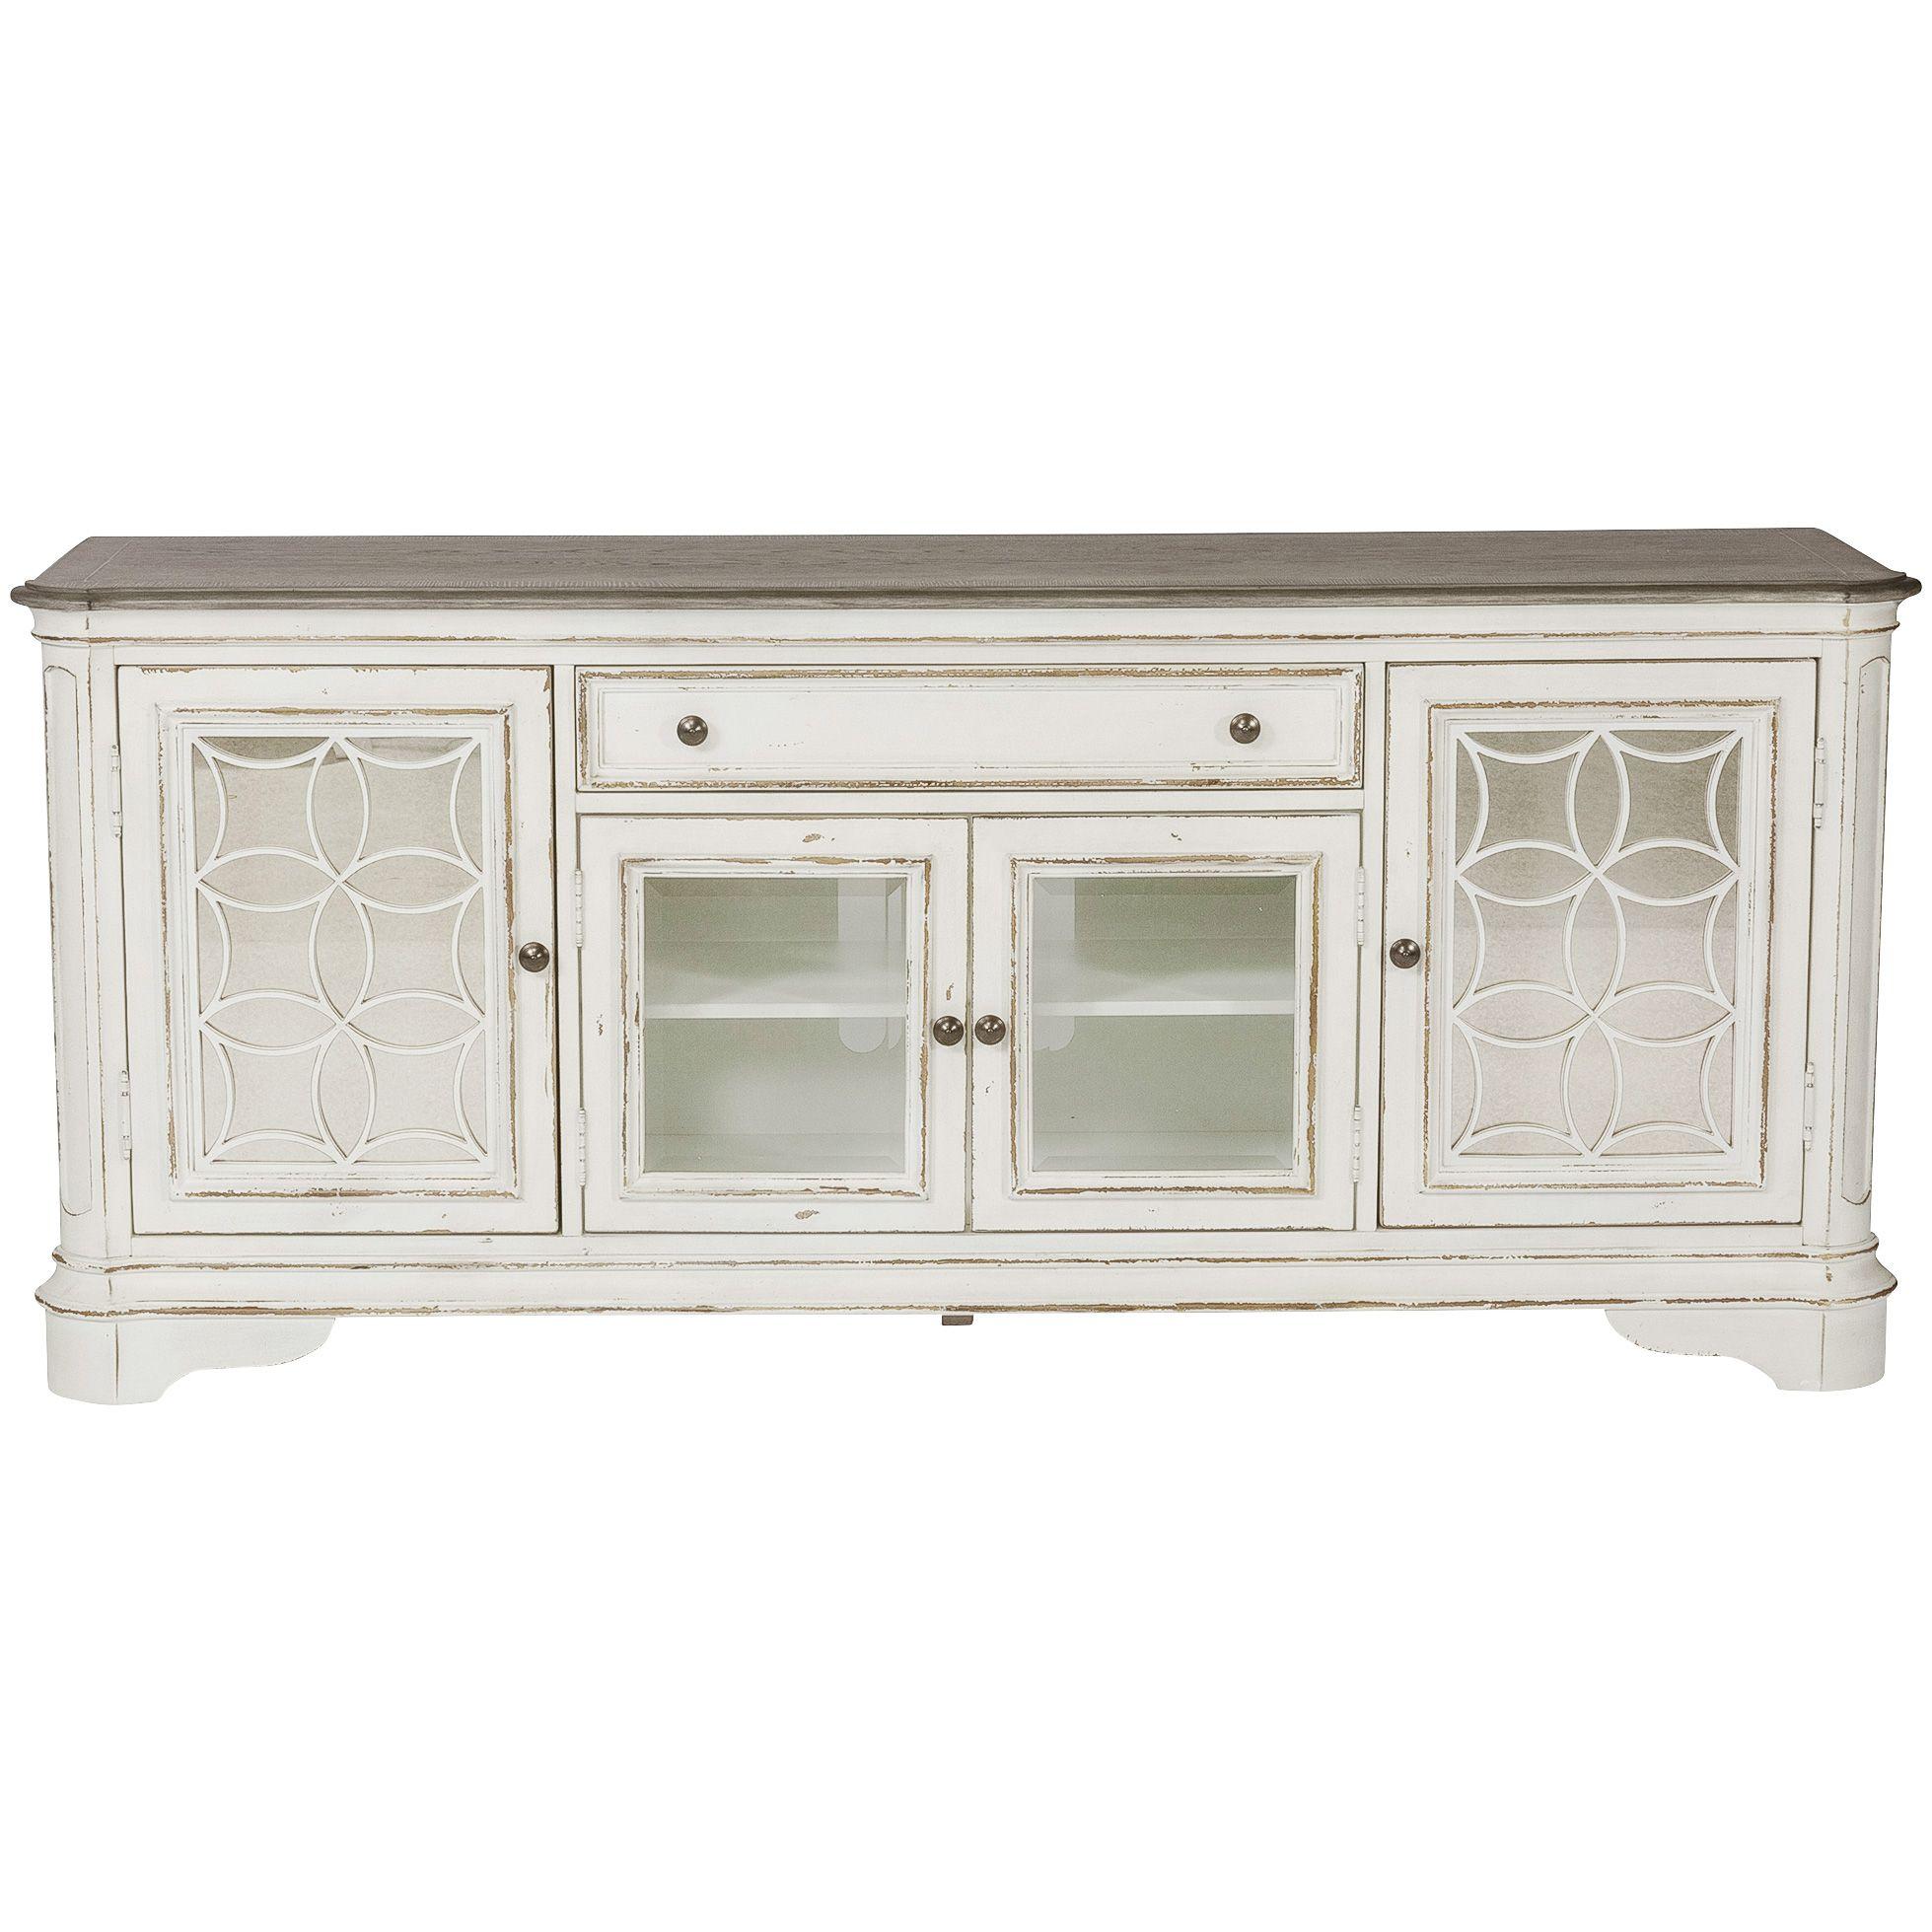 Liberty Furniture Magnolia Manor Antique White Tv Console Table In 2021 Liberty Furniture Tv Console Table Tv Console